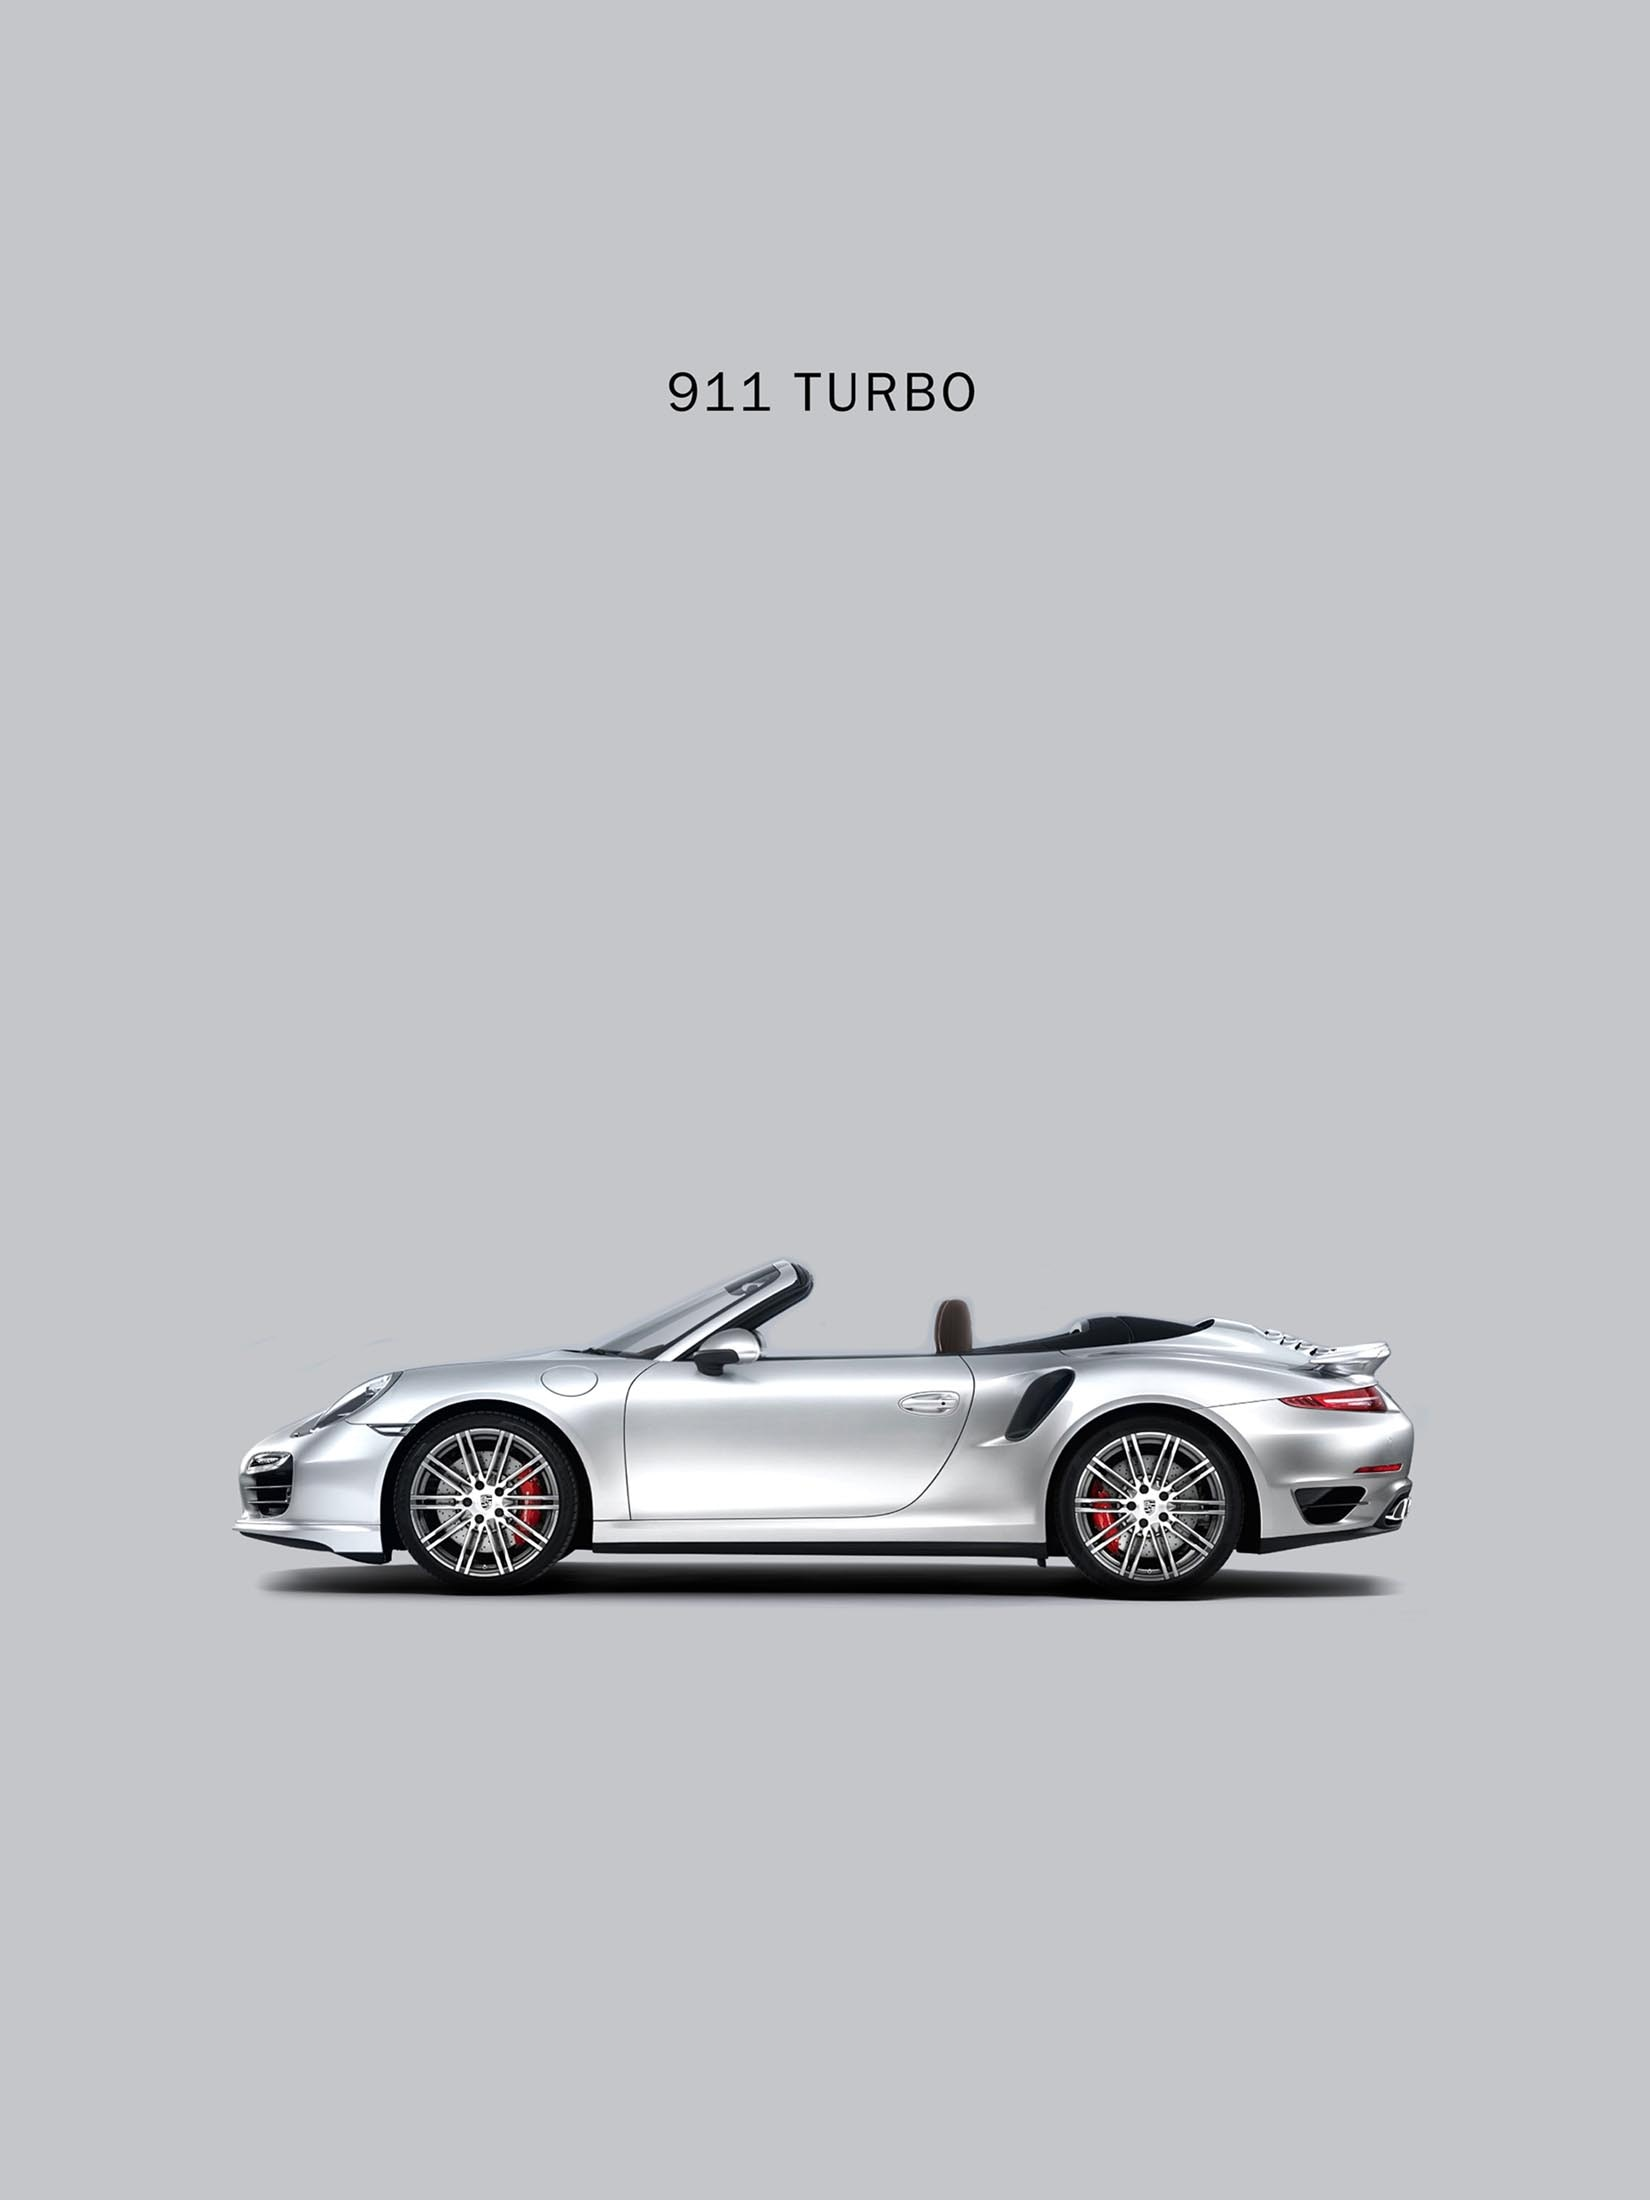 911 Turbo - Silver